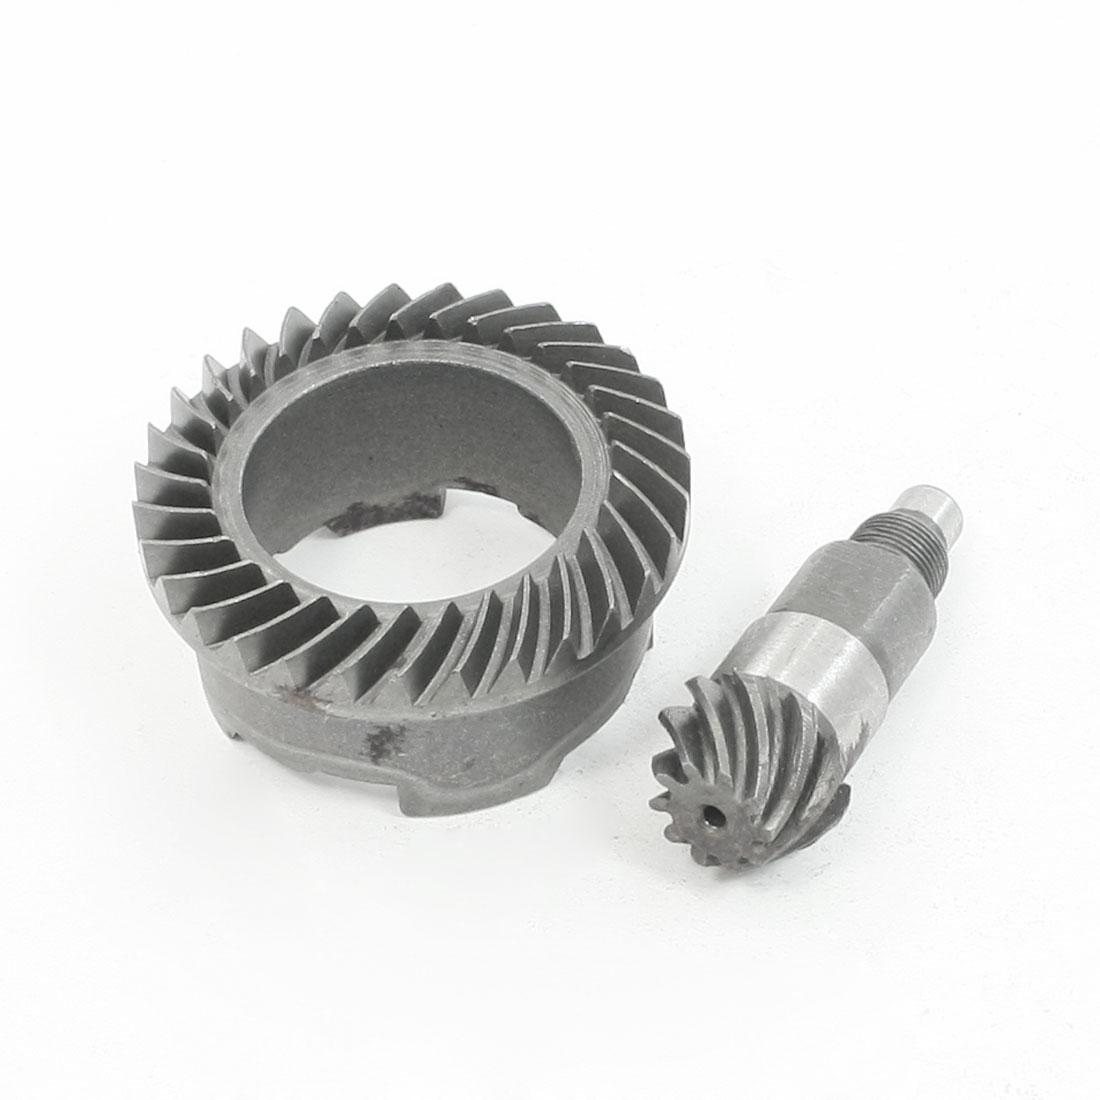 Power Tool Repair Part Spiral Bevel Gear Pinion Set for Bosch 26 Electric Hammer